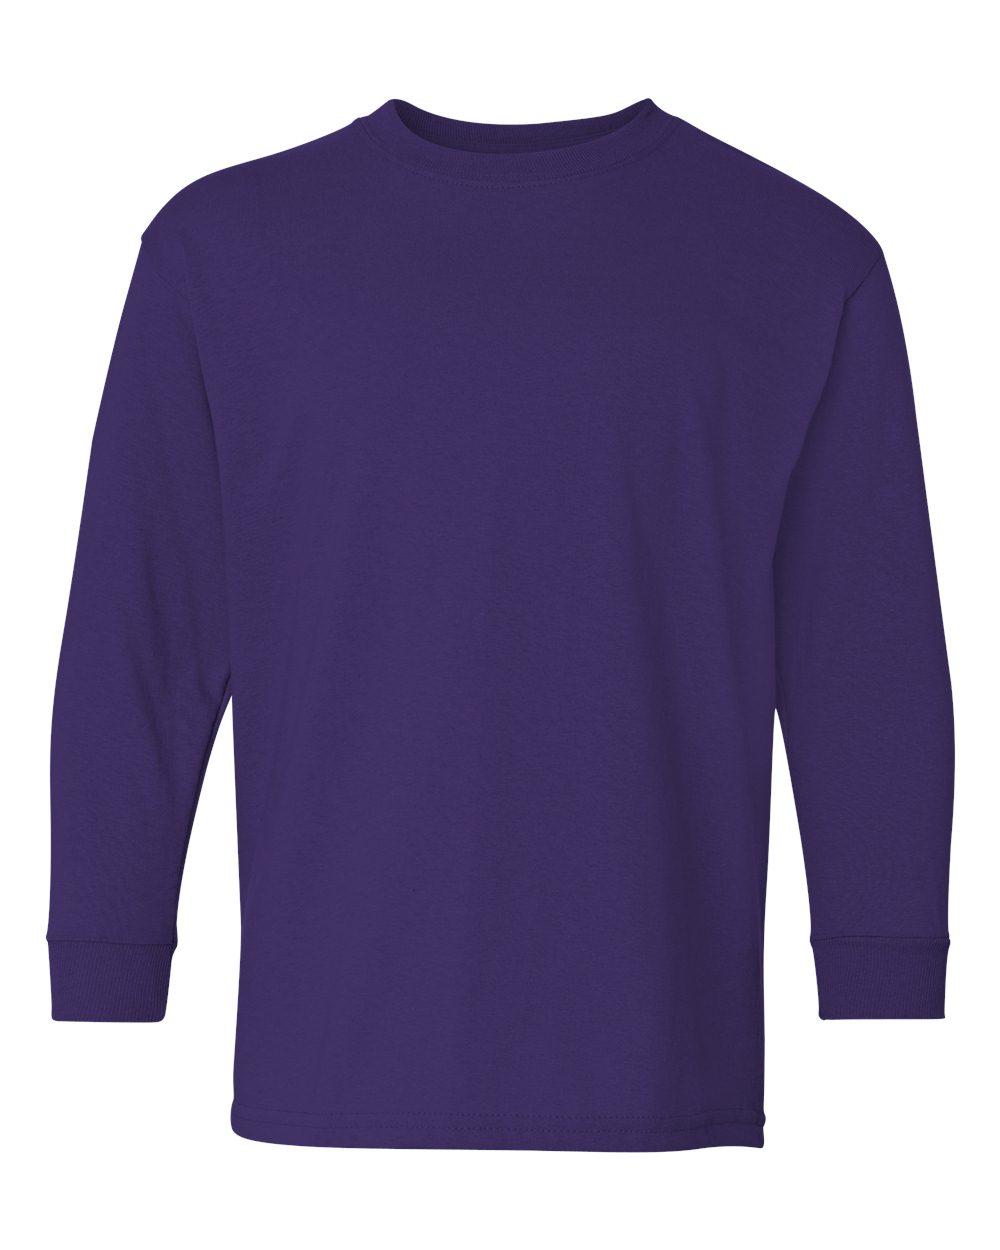 bdc72bfb6147 Gildan 5400B - Youth Heavy Cotton Long Sleeve T-Shirt | Needen USA